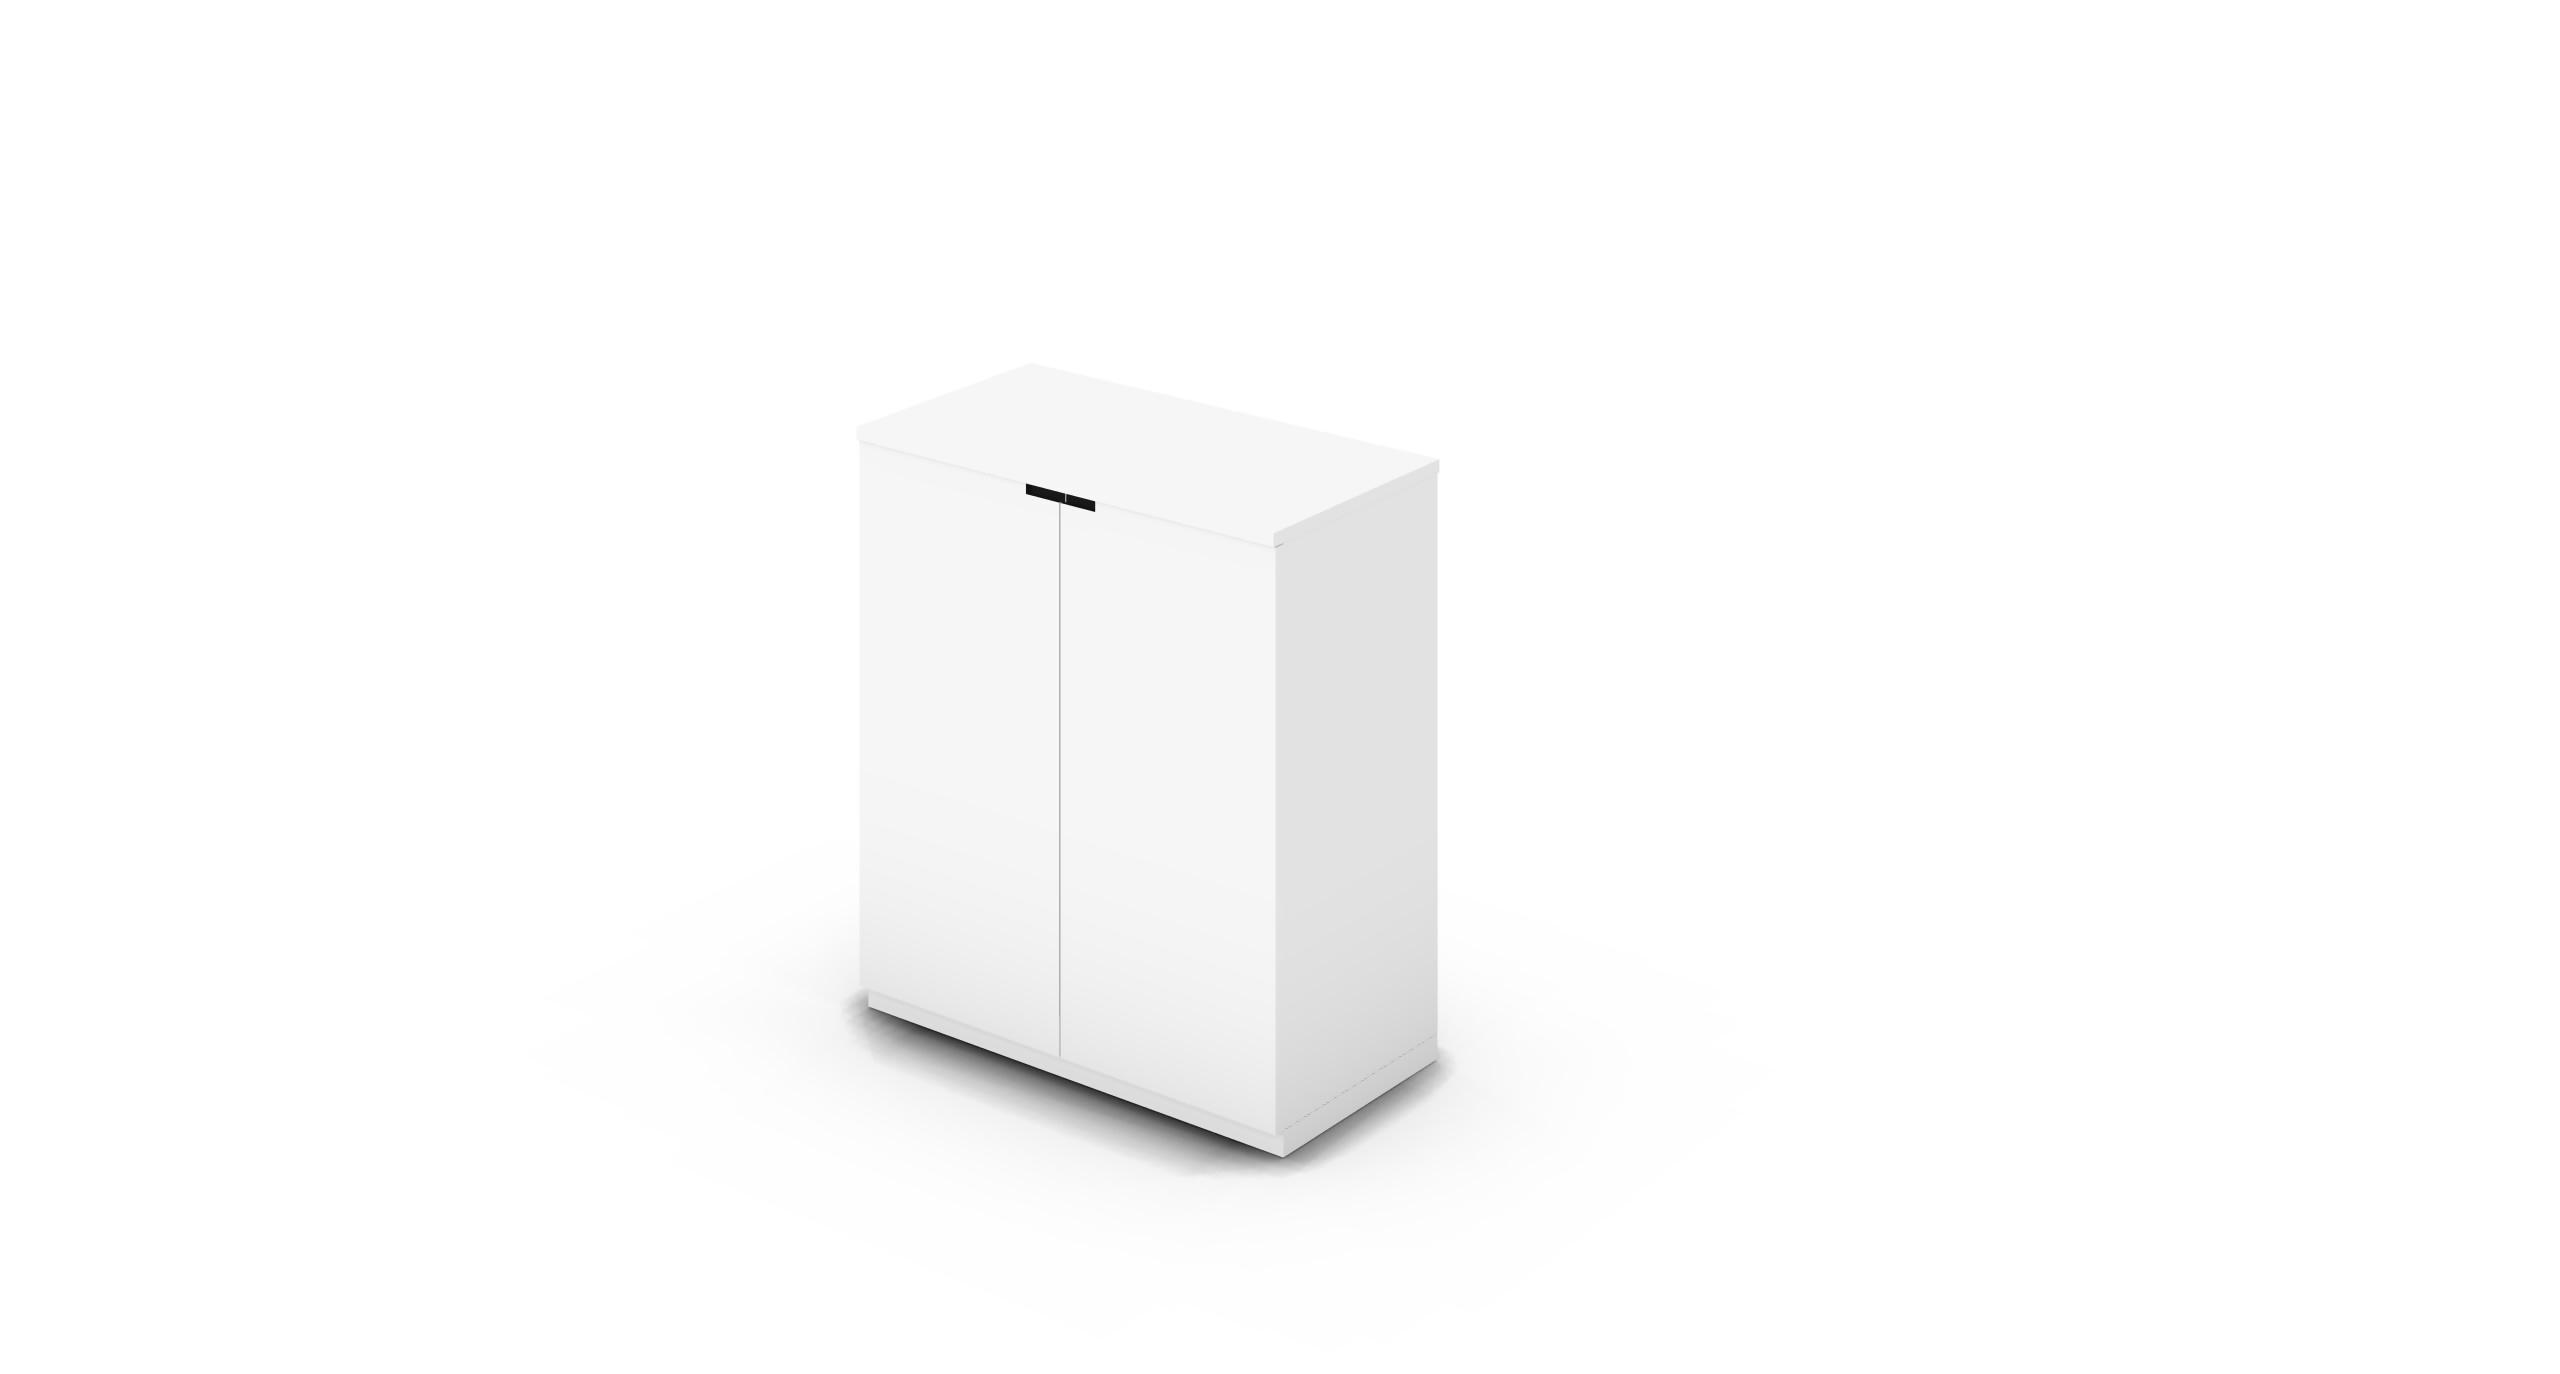 Cabinet_900x450x1125_HD_White_CutOut_NoCylinder